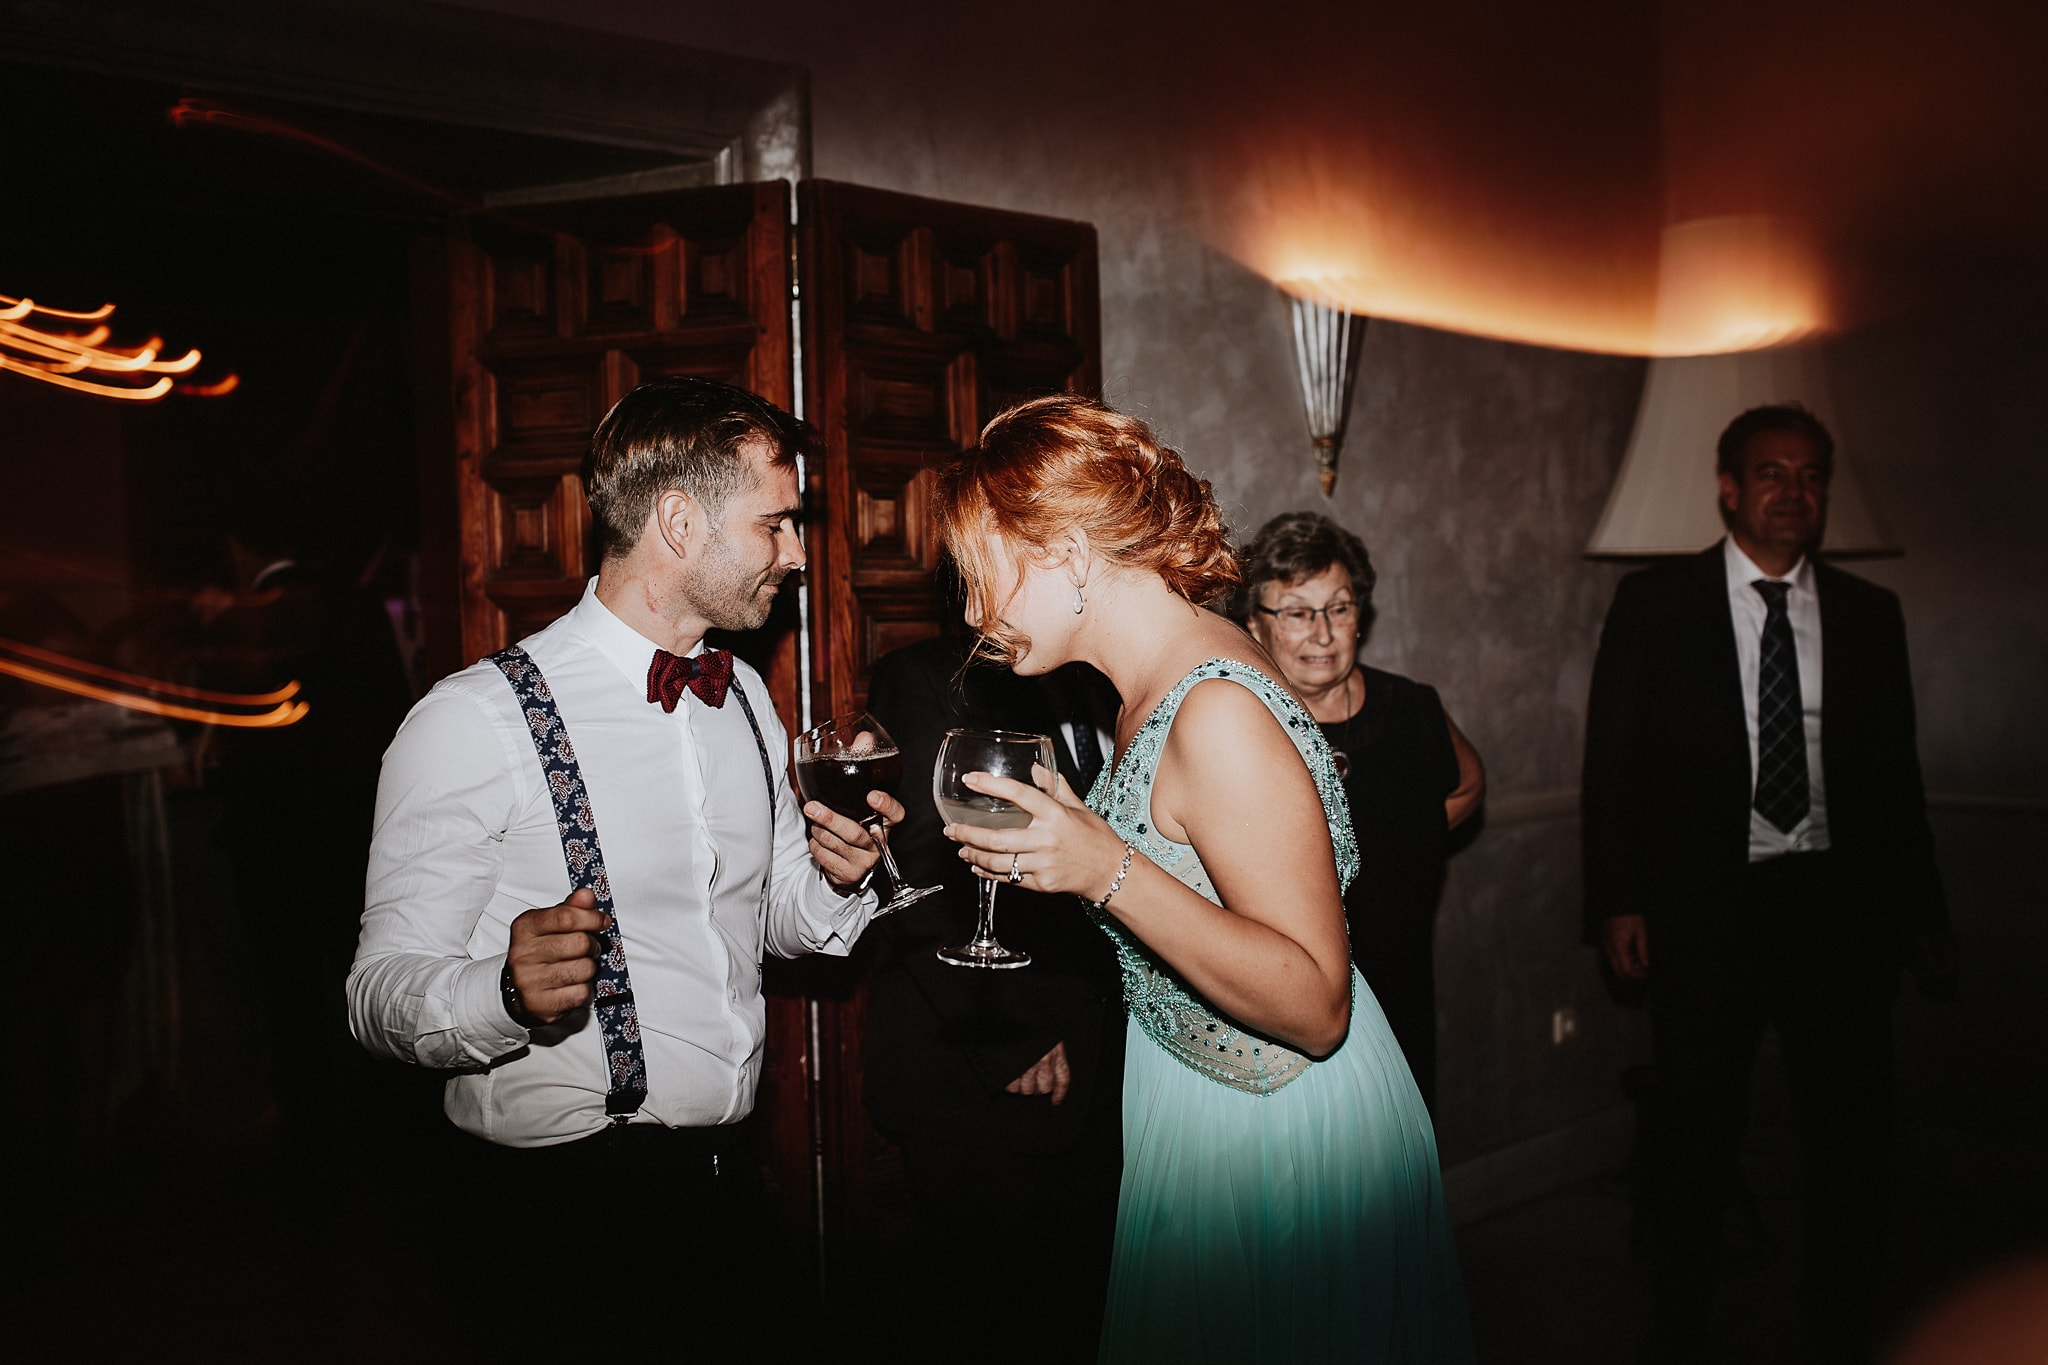 prisma-blanco-fotografos-bodas-toledo-177